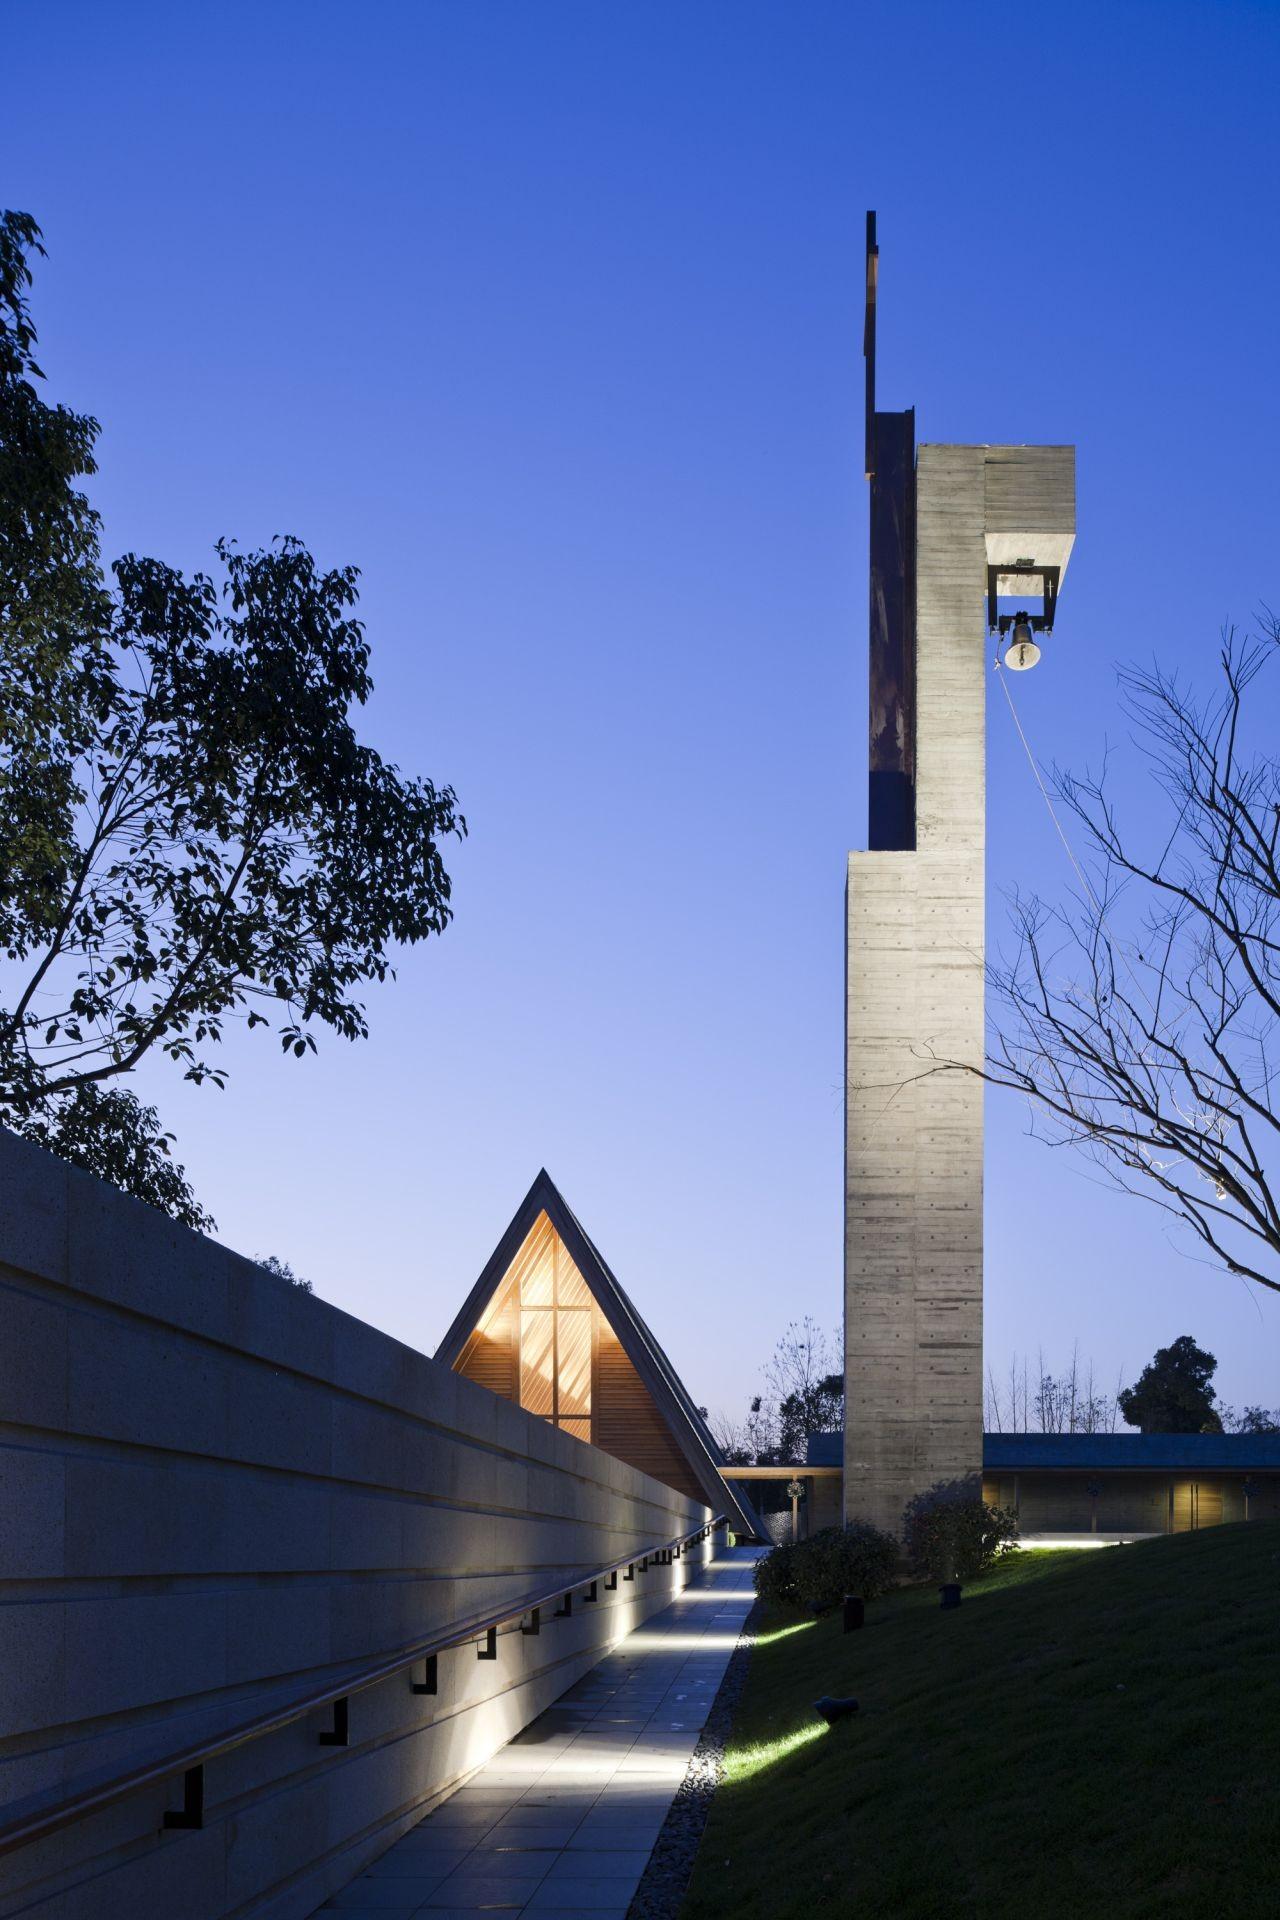 Gallery of mei li zhou church tsushima design studio 4 for Church exterior design ideas